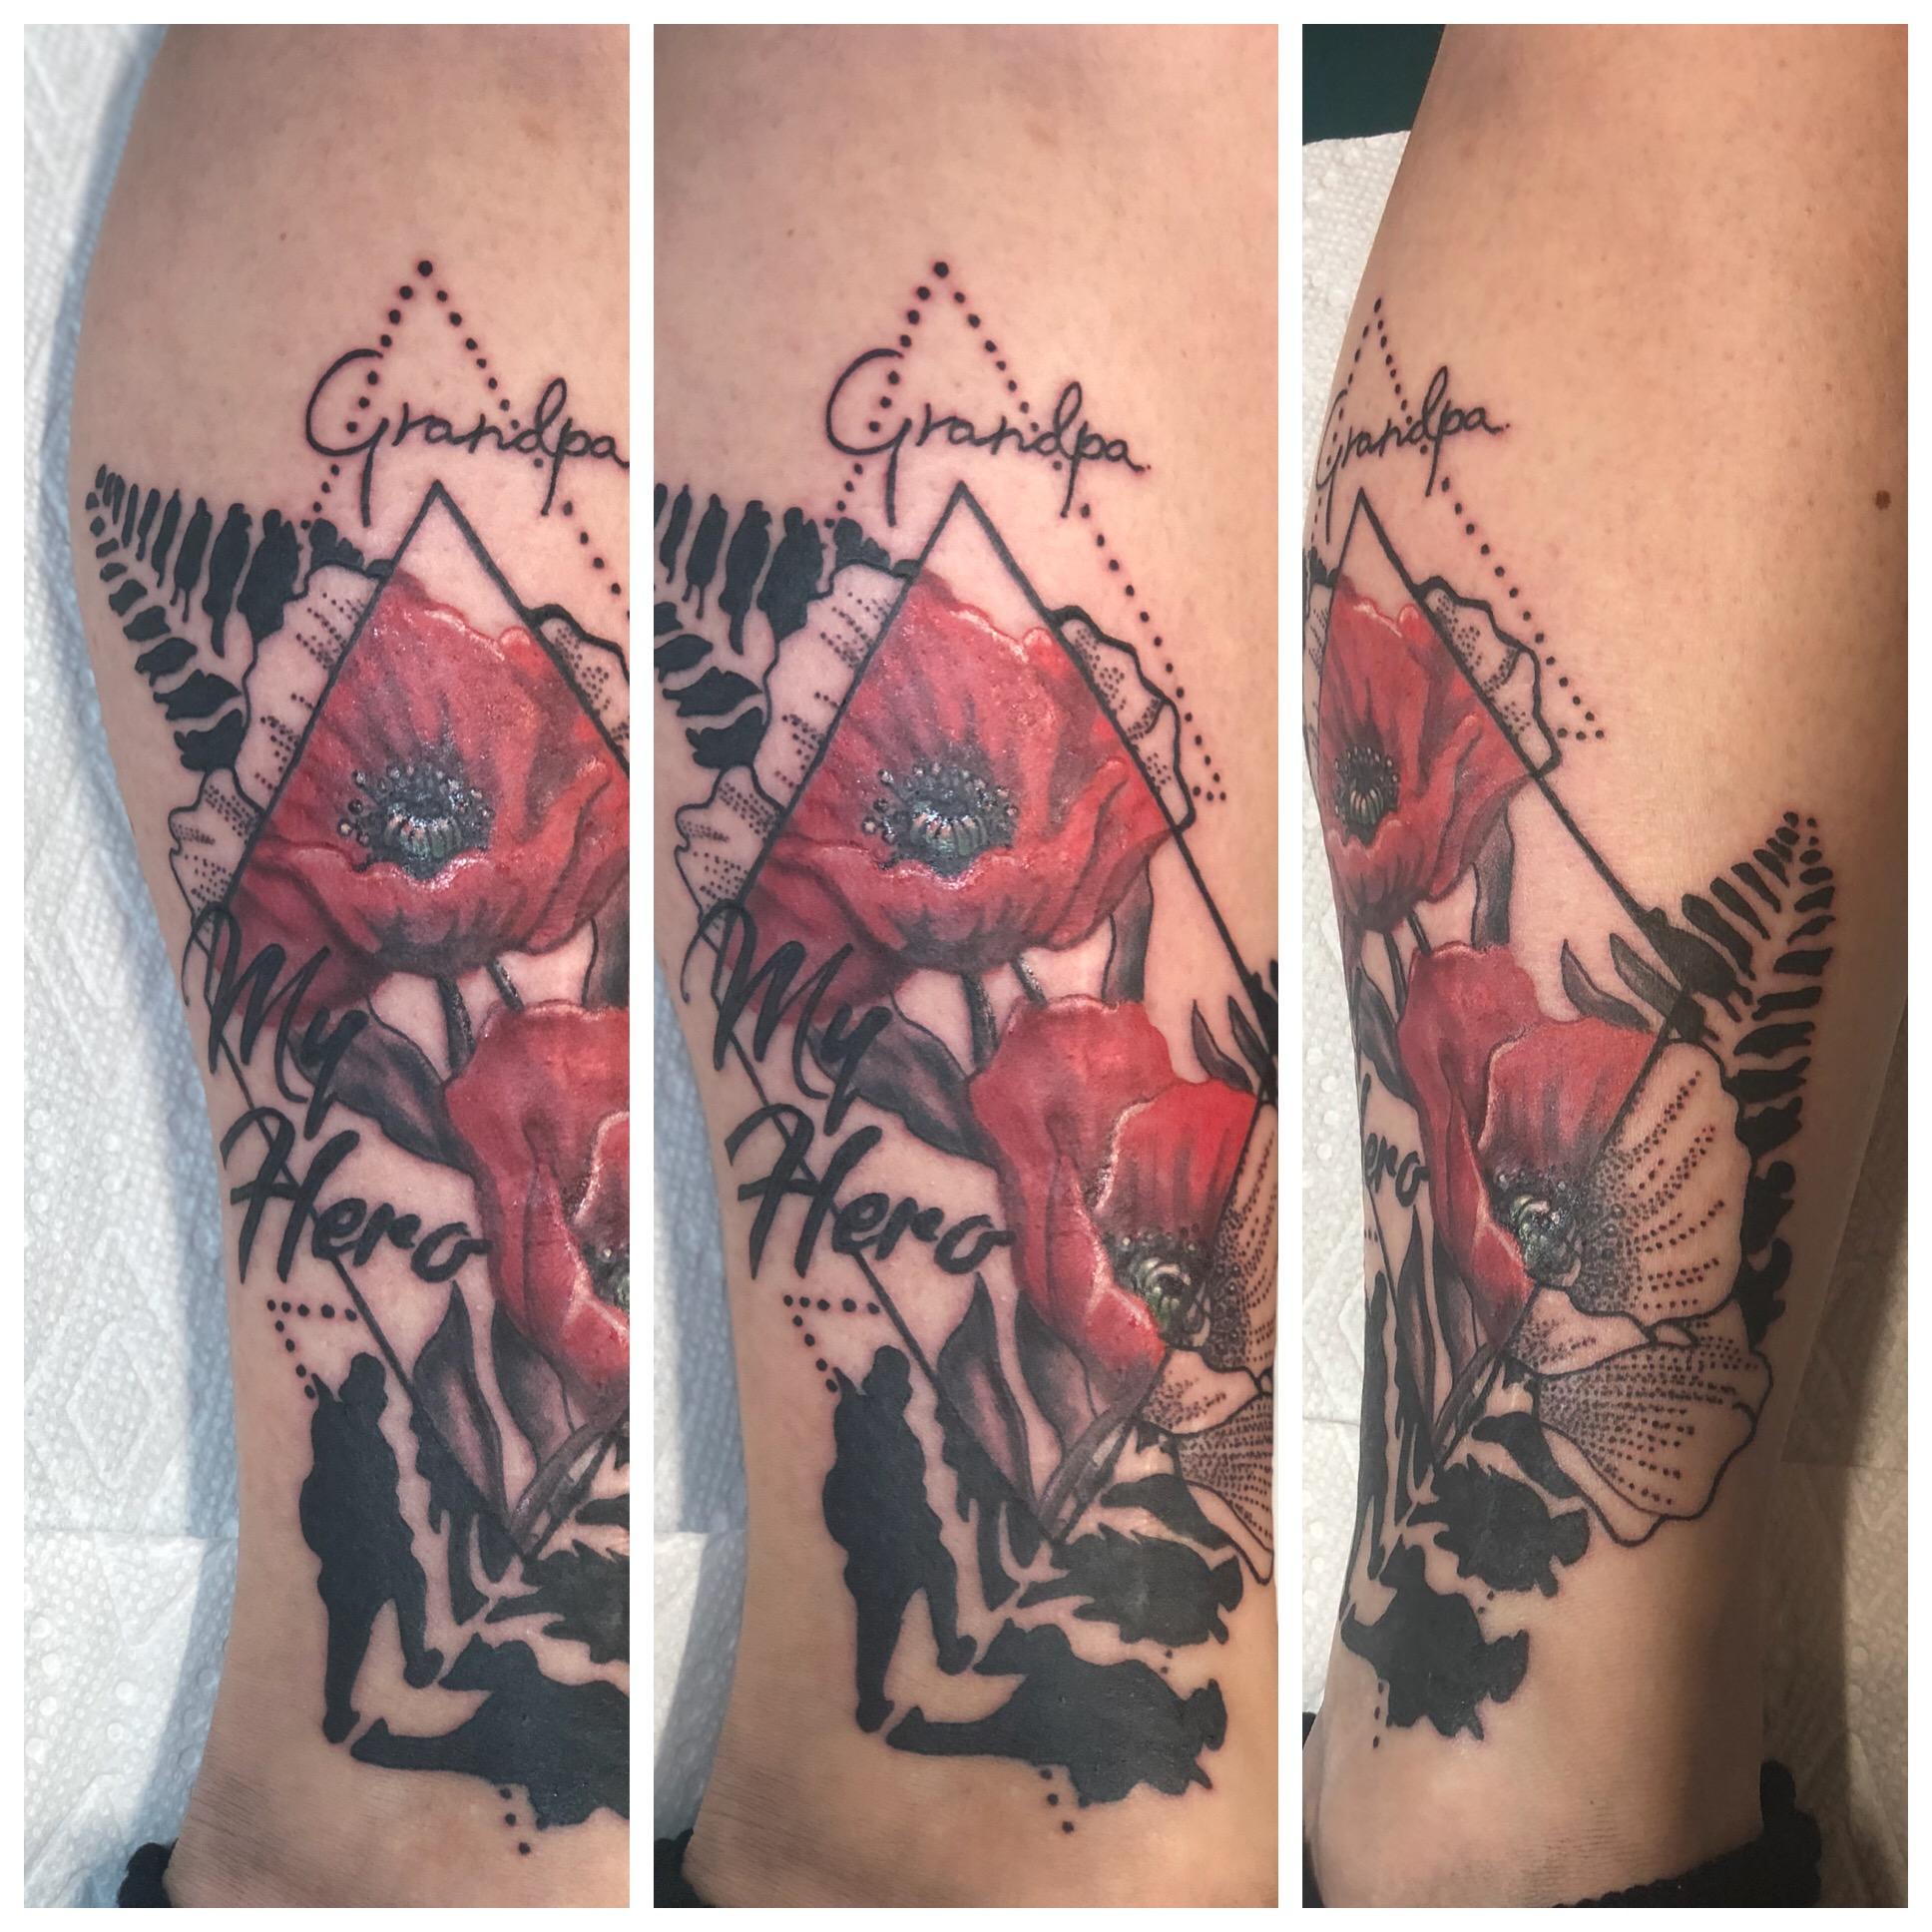 Geometric and Realistic Poppy Tattoo